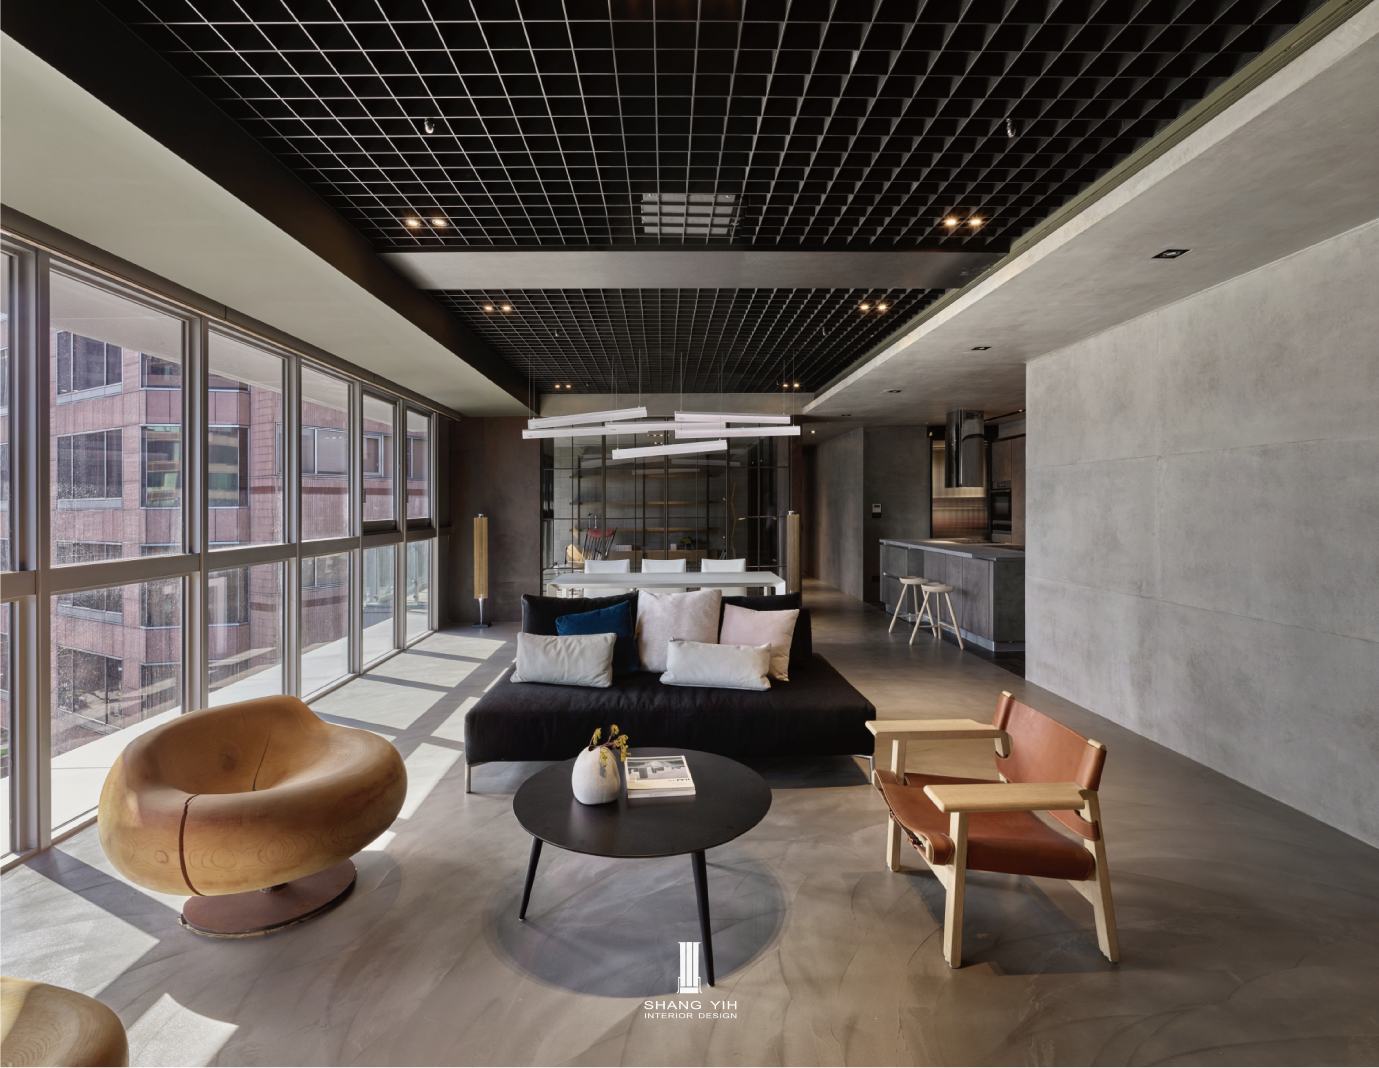 Pin by 尚藝室內設計 SY interior design on 客廳LIVING ROOM